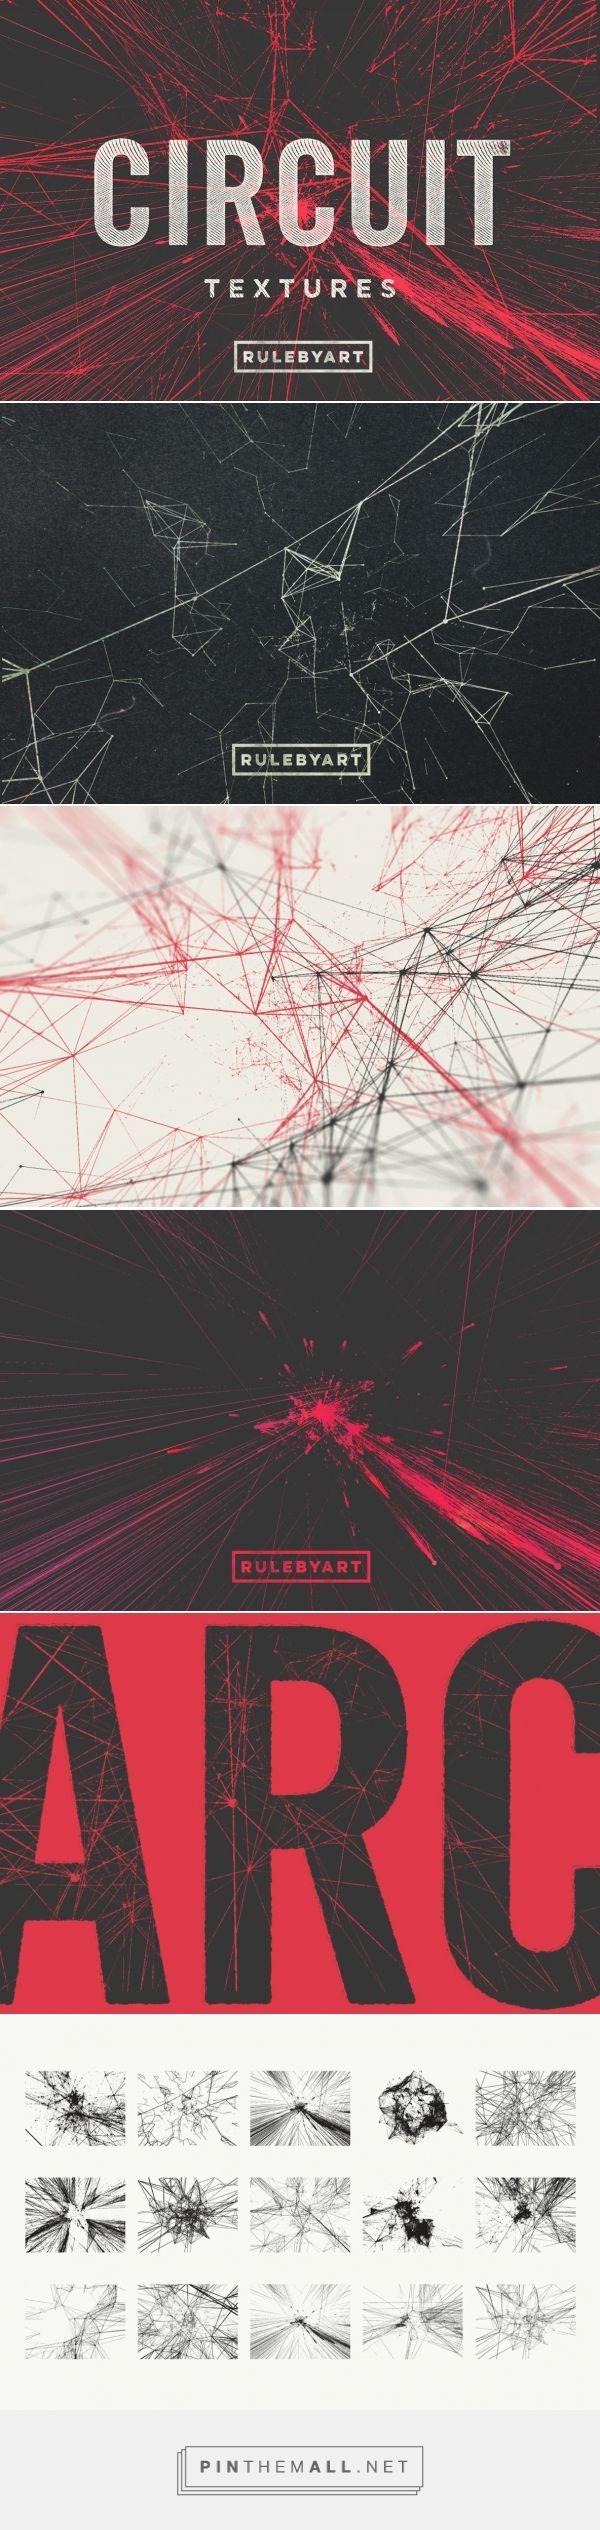 Circuit   Pinterest   Infográfico, Infográficos e Utilidades